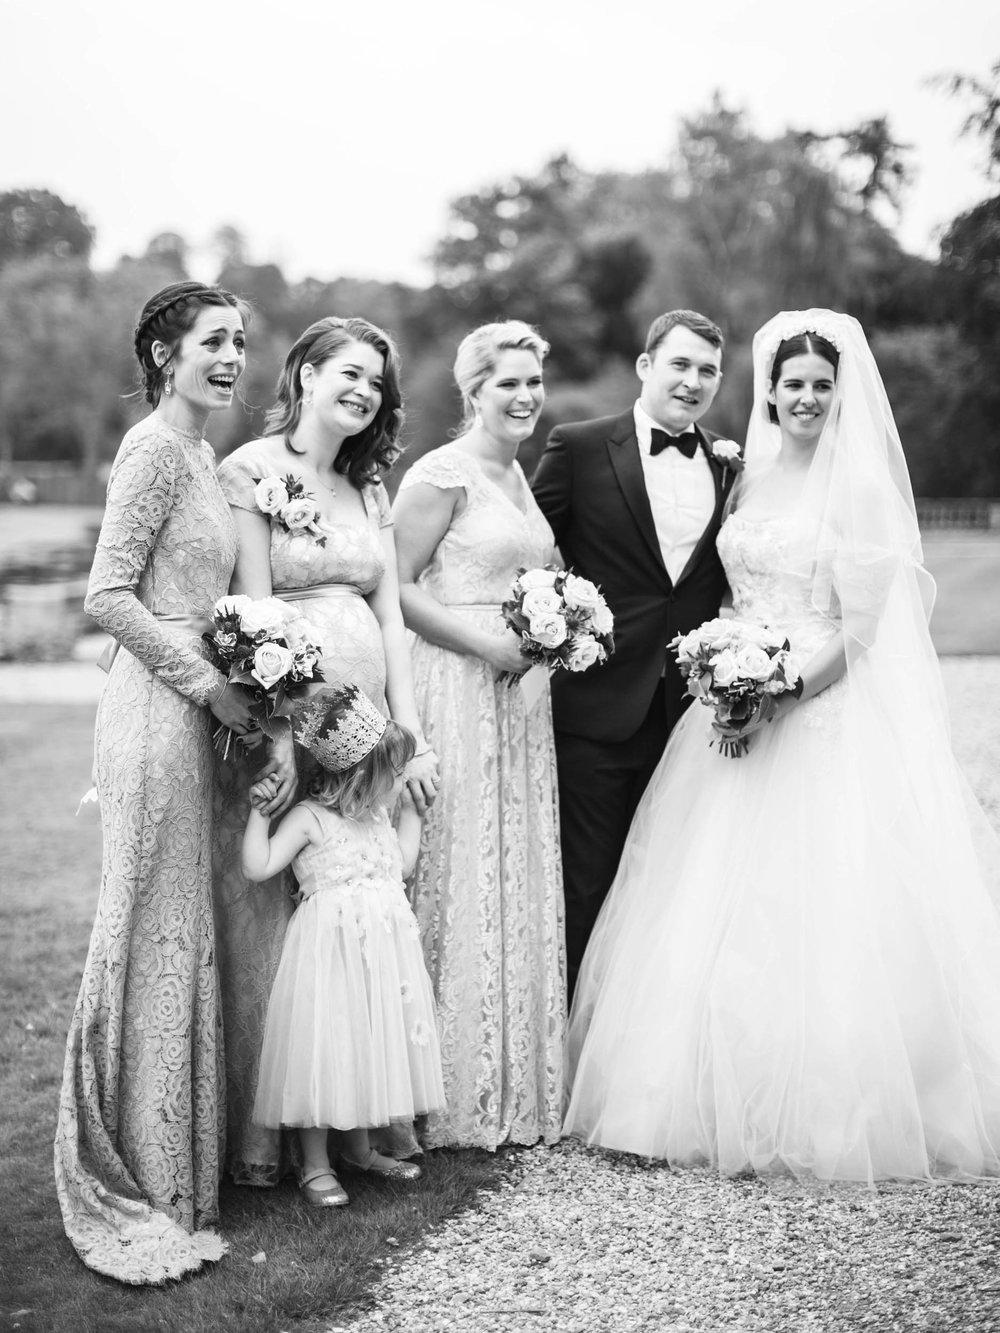 Amy O'Boyle Photography- Destination & UK Fine Art Film Wedding Photographer- Stoneleigh Abbey Wedding-50.jpg